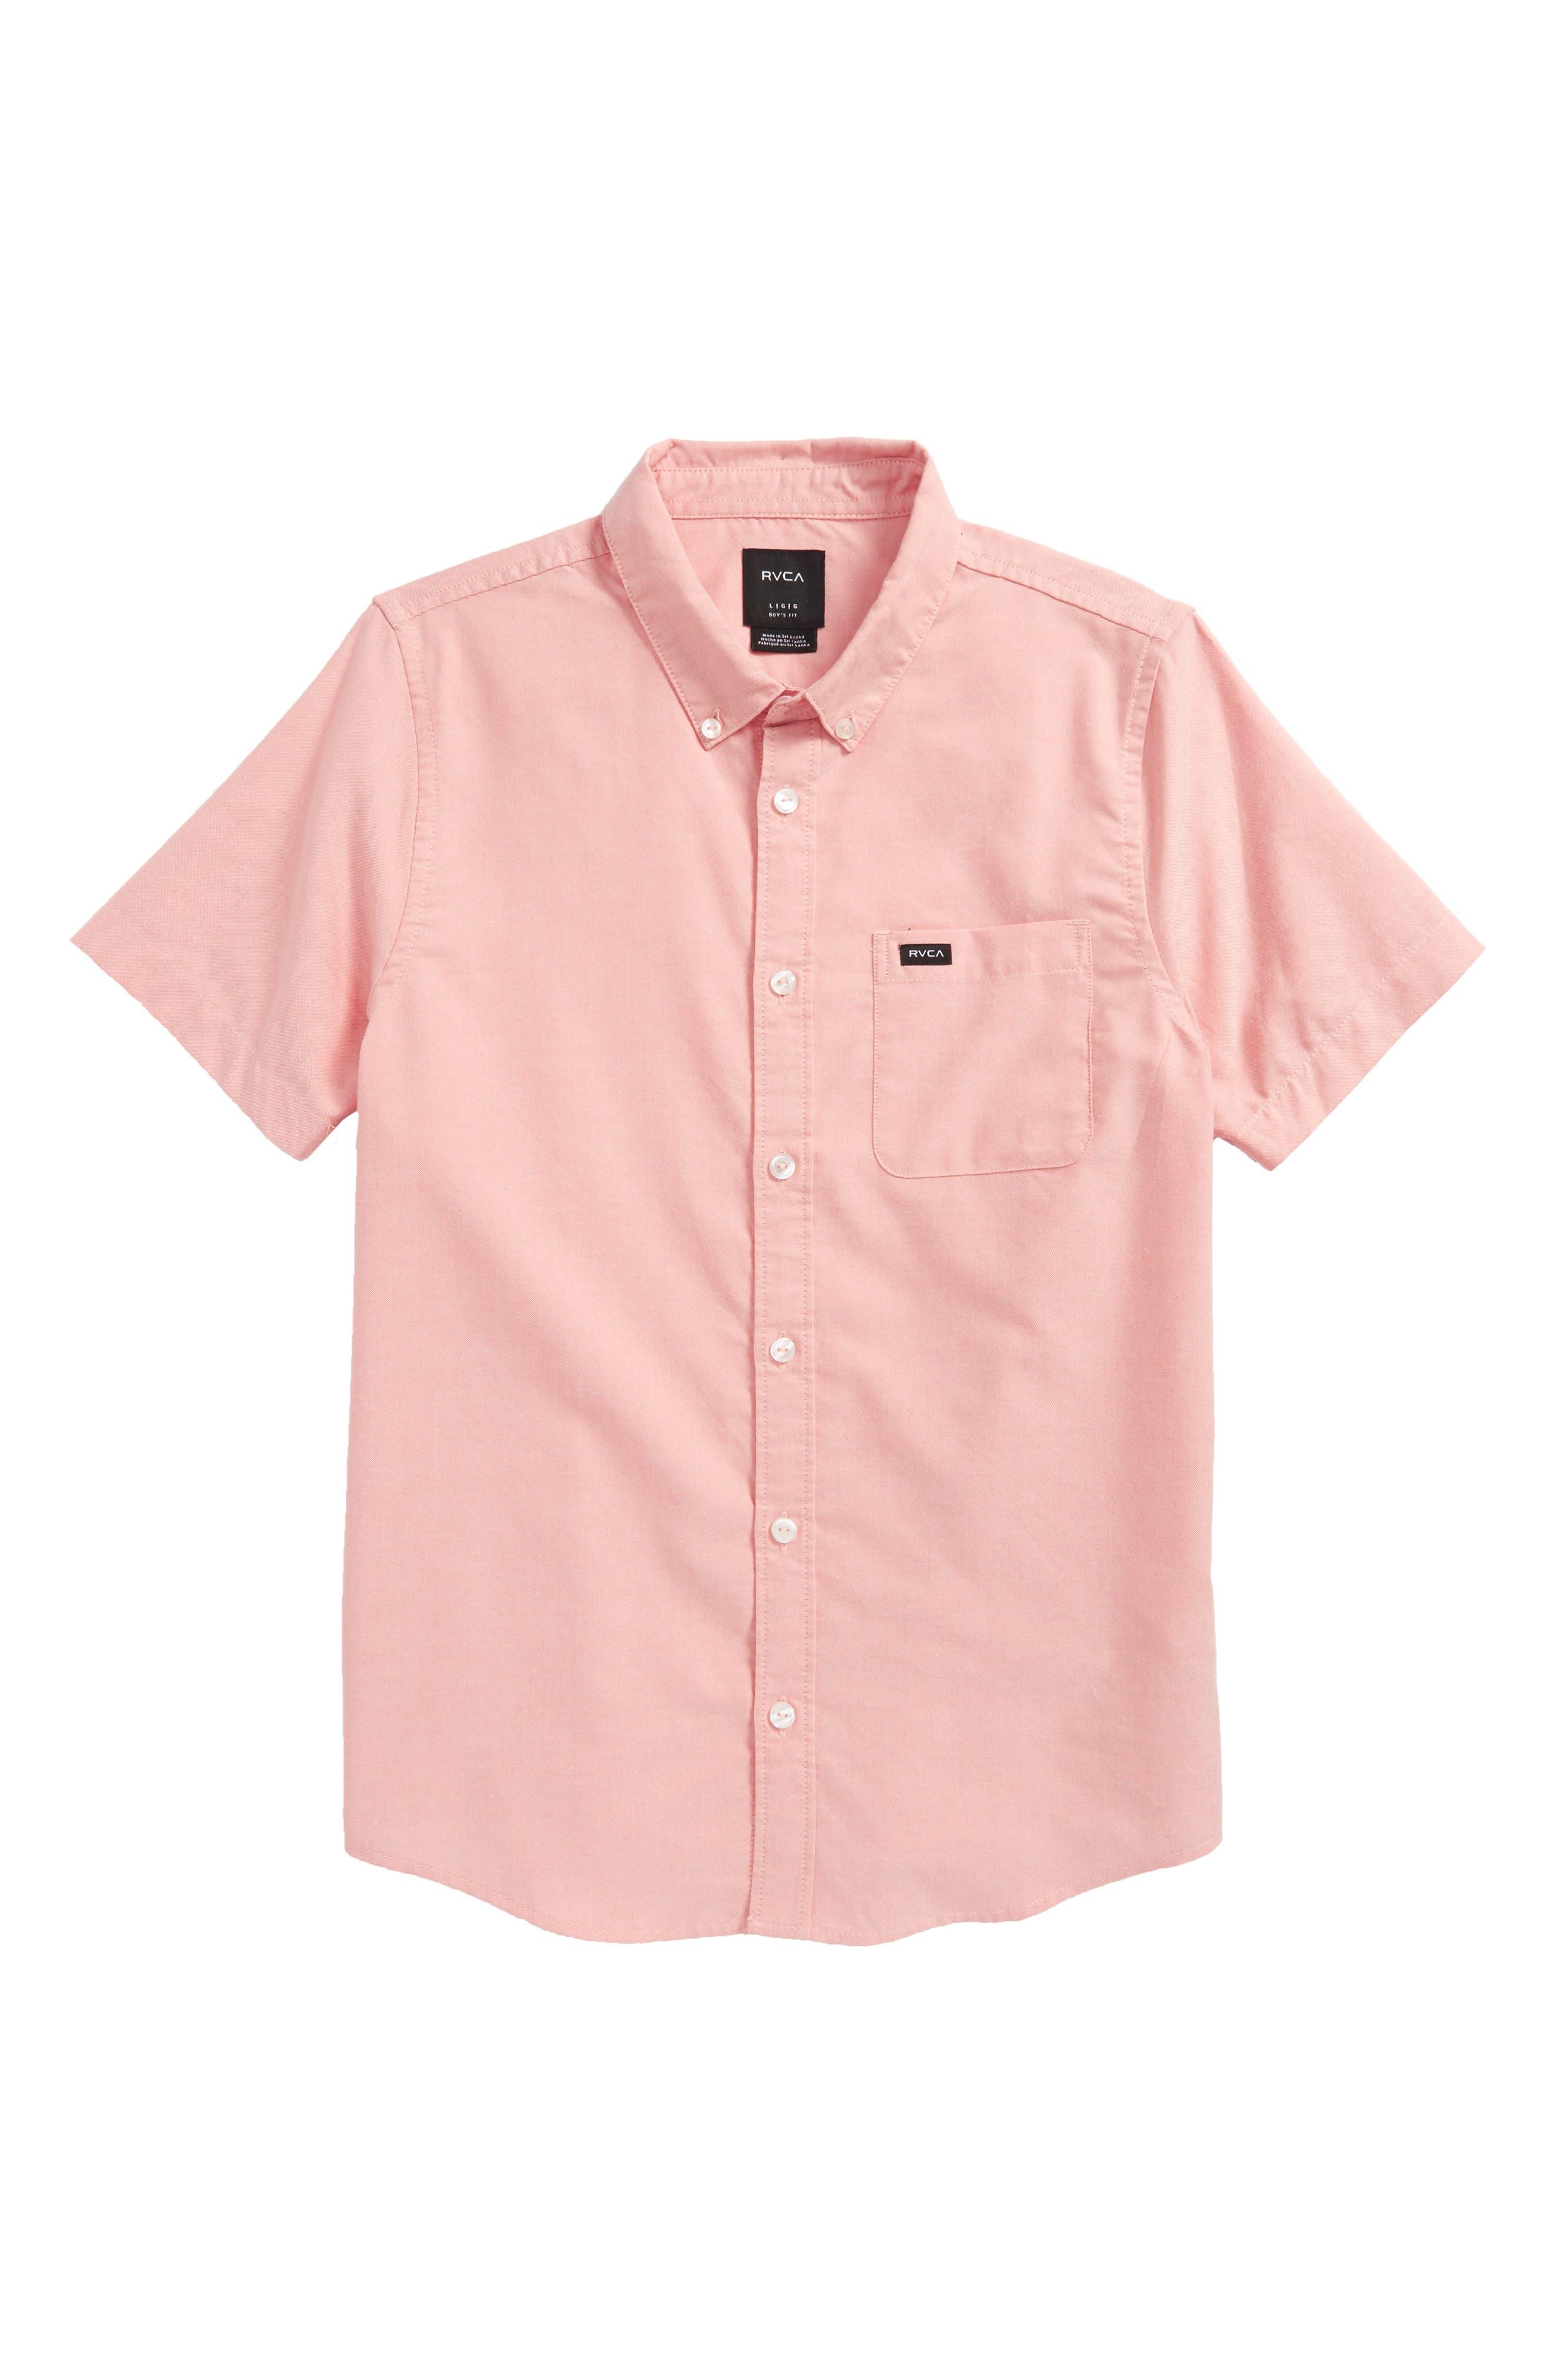 'That'll Do' Woven Shirt,                             Main thumbnail 7, color,